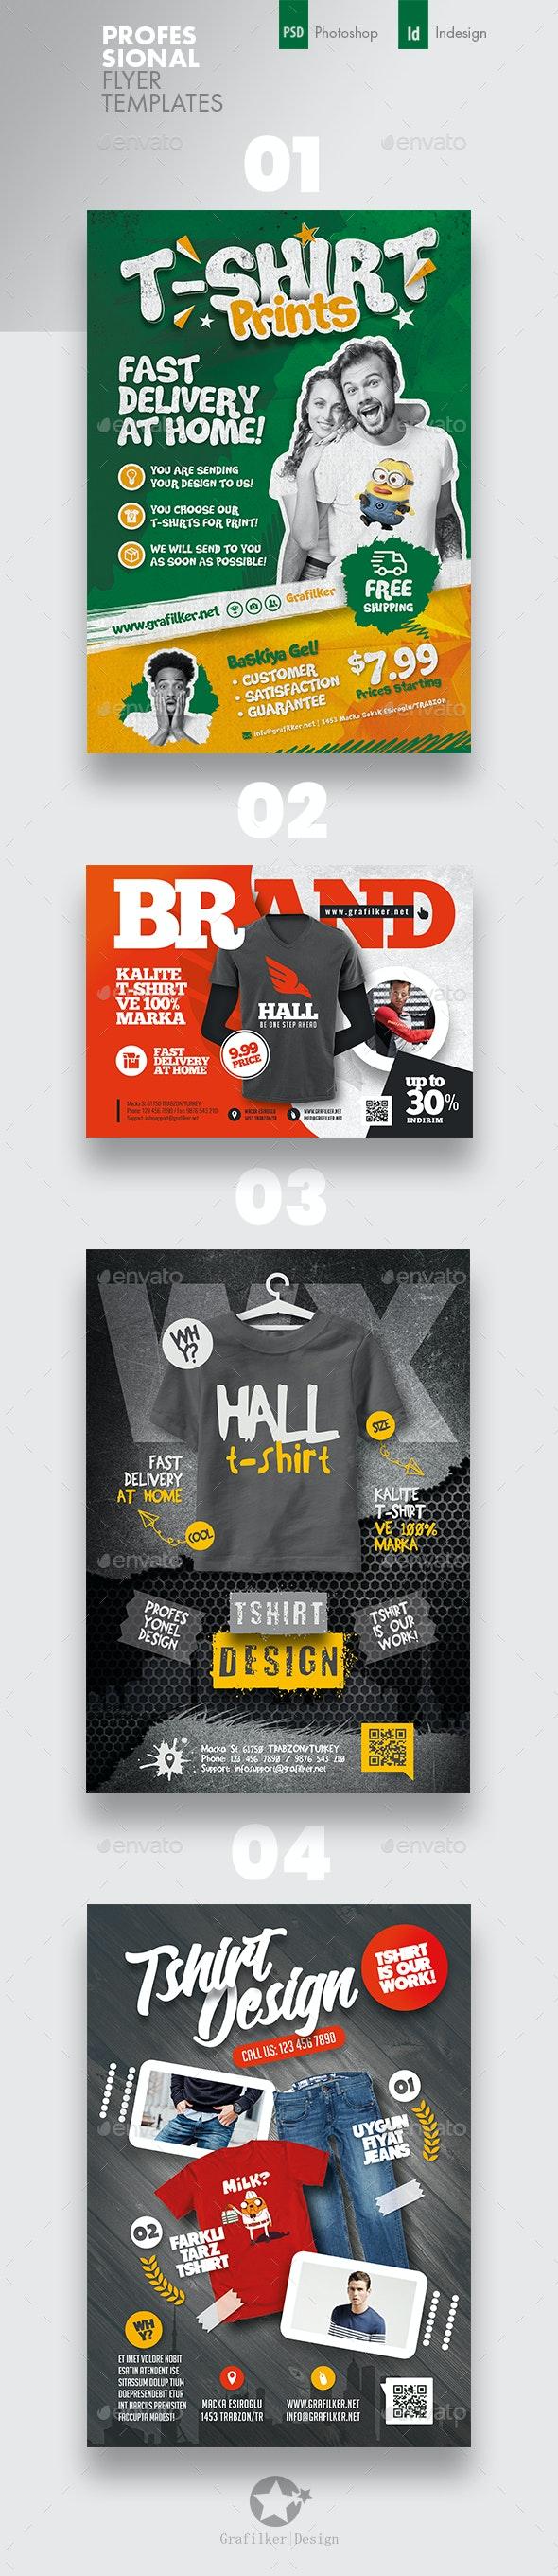 T-Shirt Flyer Bundle Templates - Corporate Flyers